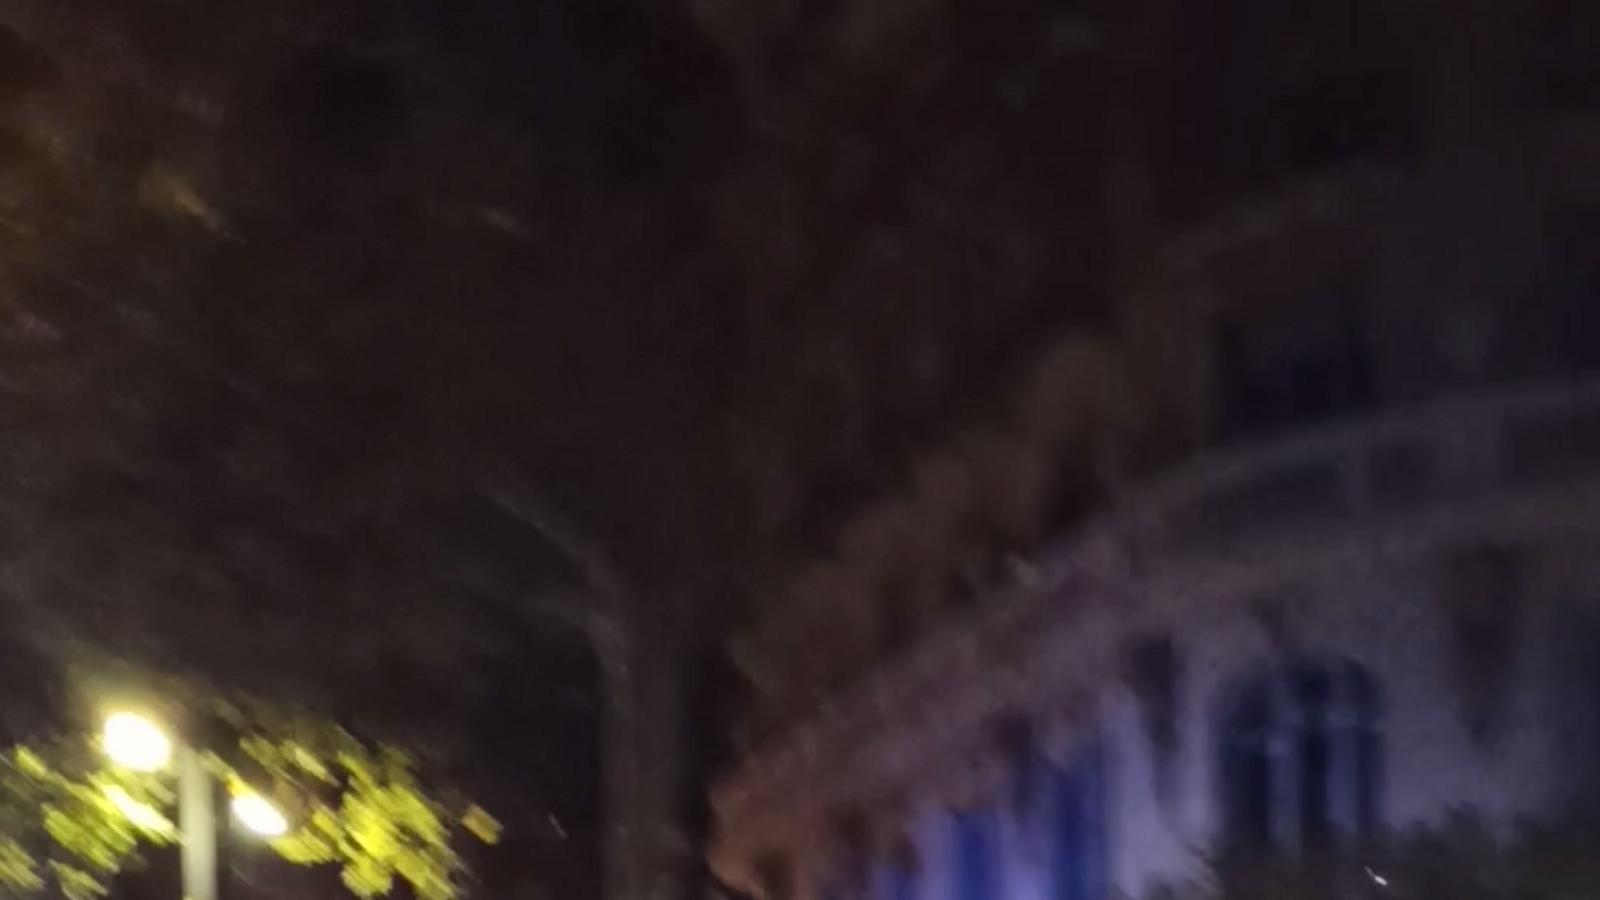 Agents de la Guàrdia Urbana disparen un home a Barcelona que hauria intentat agredir-los